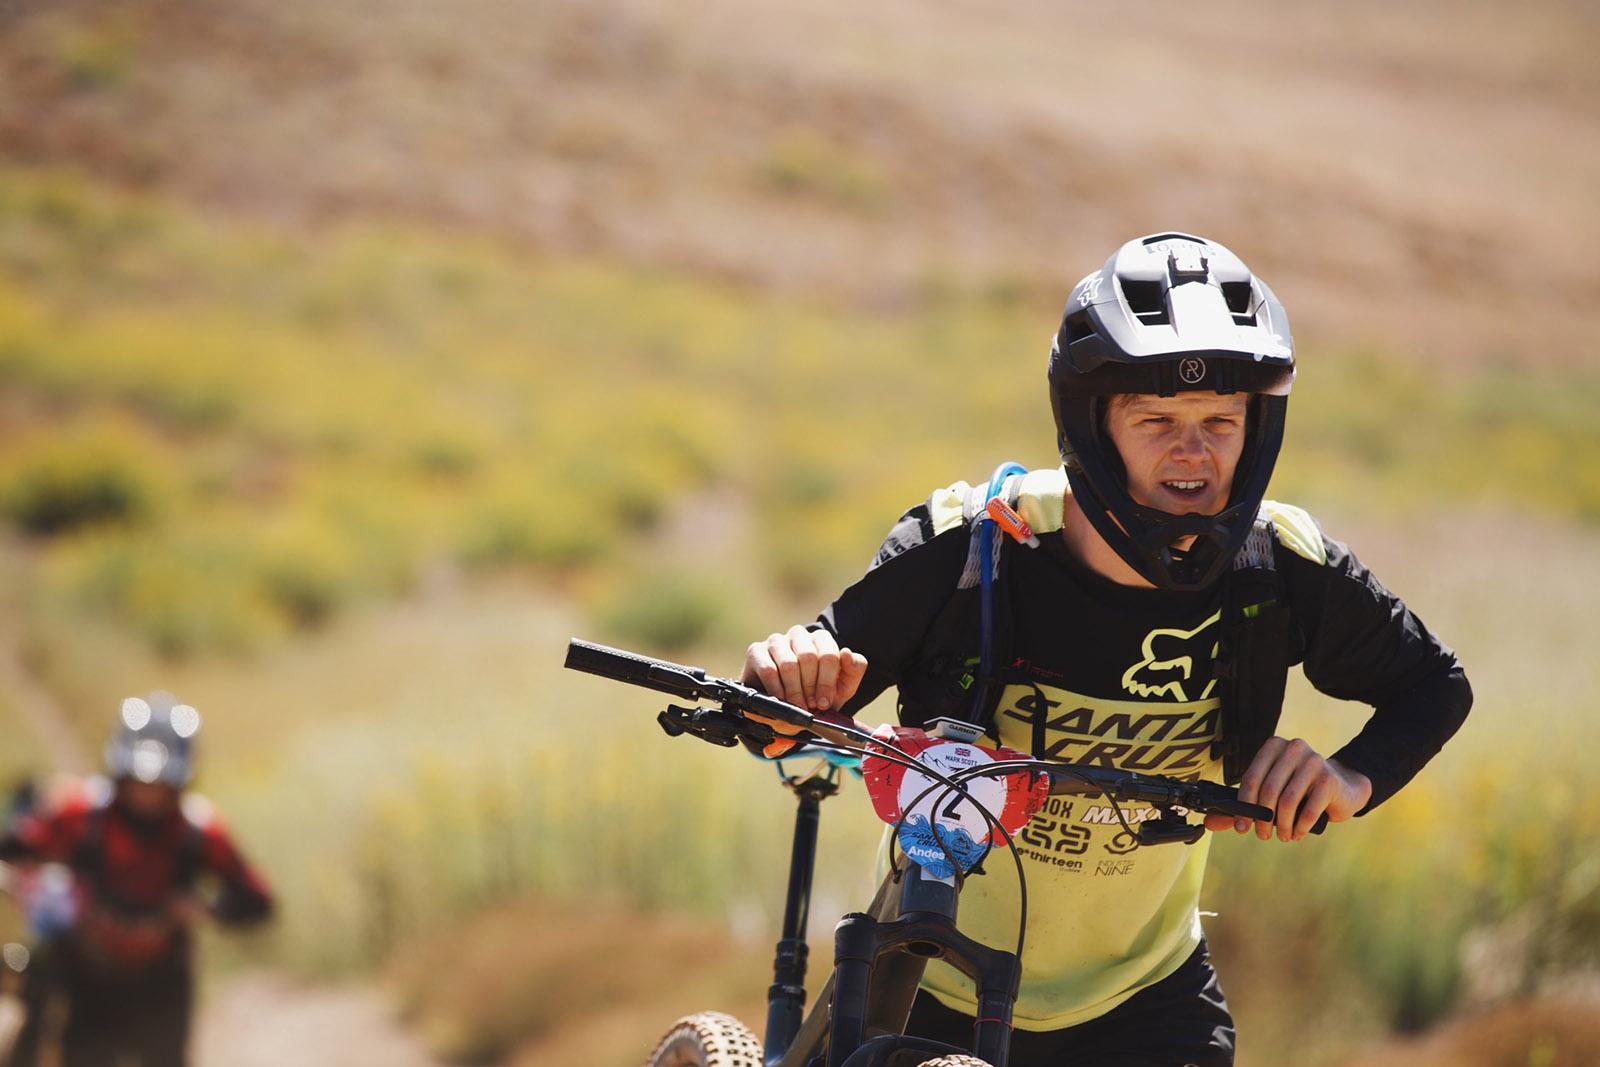 Santa Cruz Bicycles - Mark Scott at Andes Pacifico